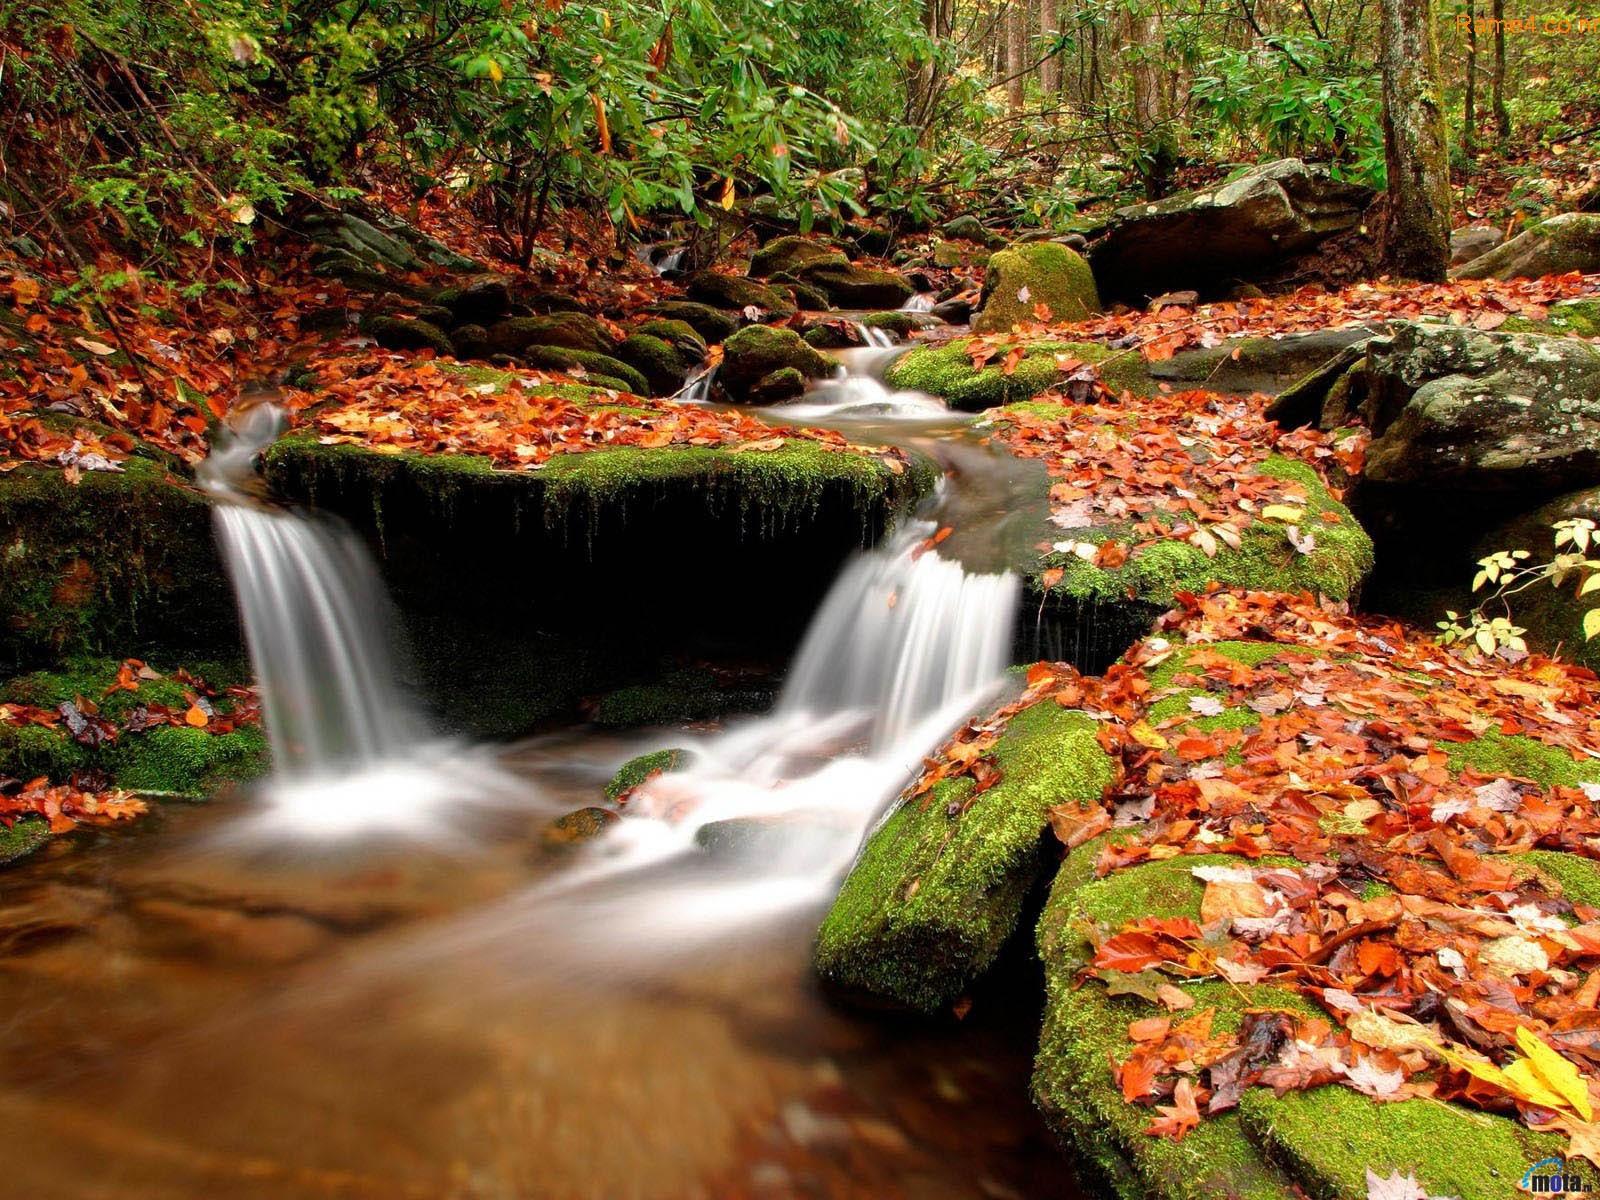 http://4.bp.blogspot.com/-yoIZgMRFkU8/TdN1N7S_XFI/AAAAAAAAAro/p5aRvjIjhZc/s1600/nature_wallpaper_pics_Desktop_Nature_Wallpaper.jpg